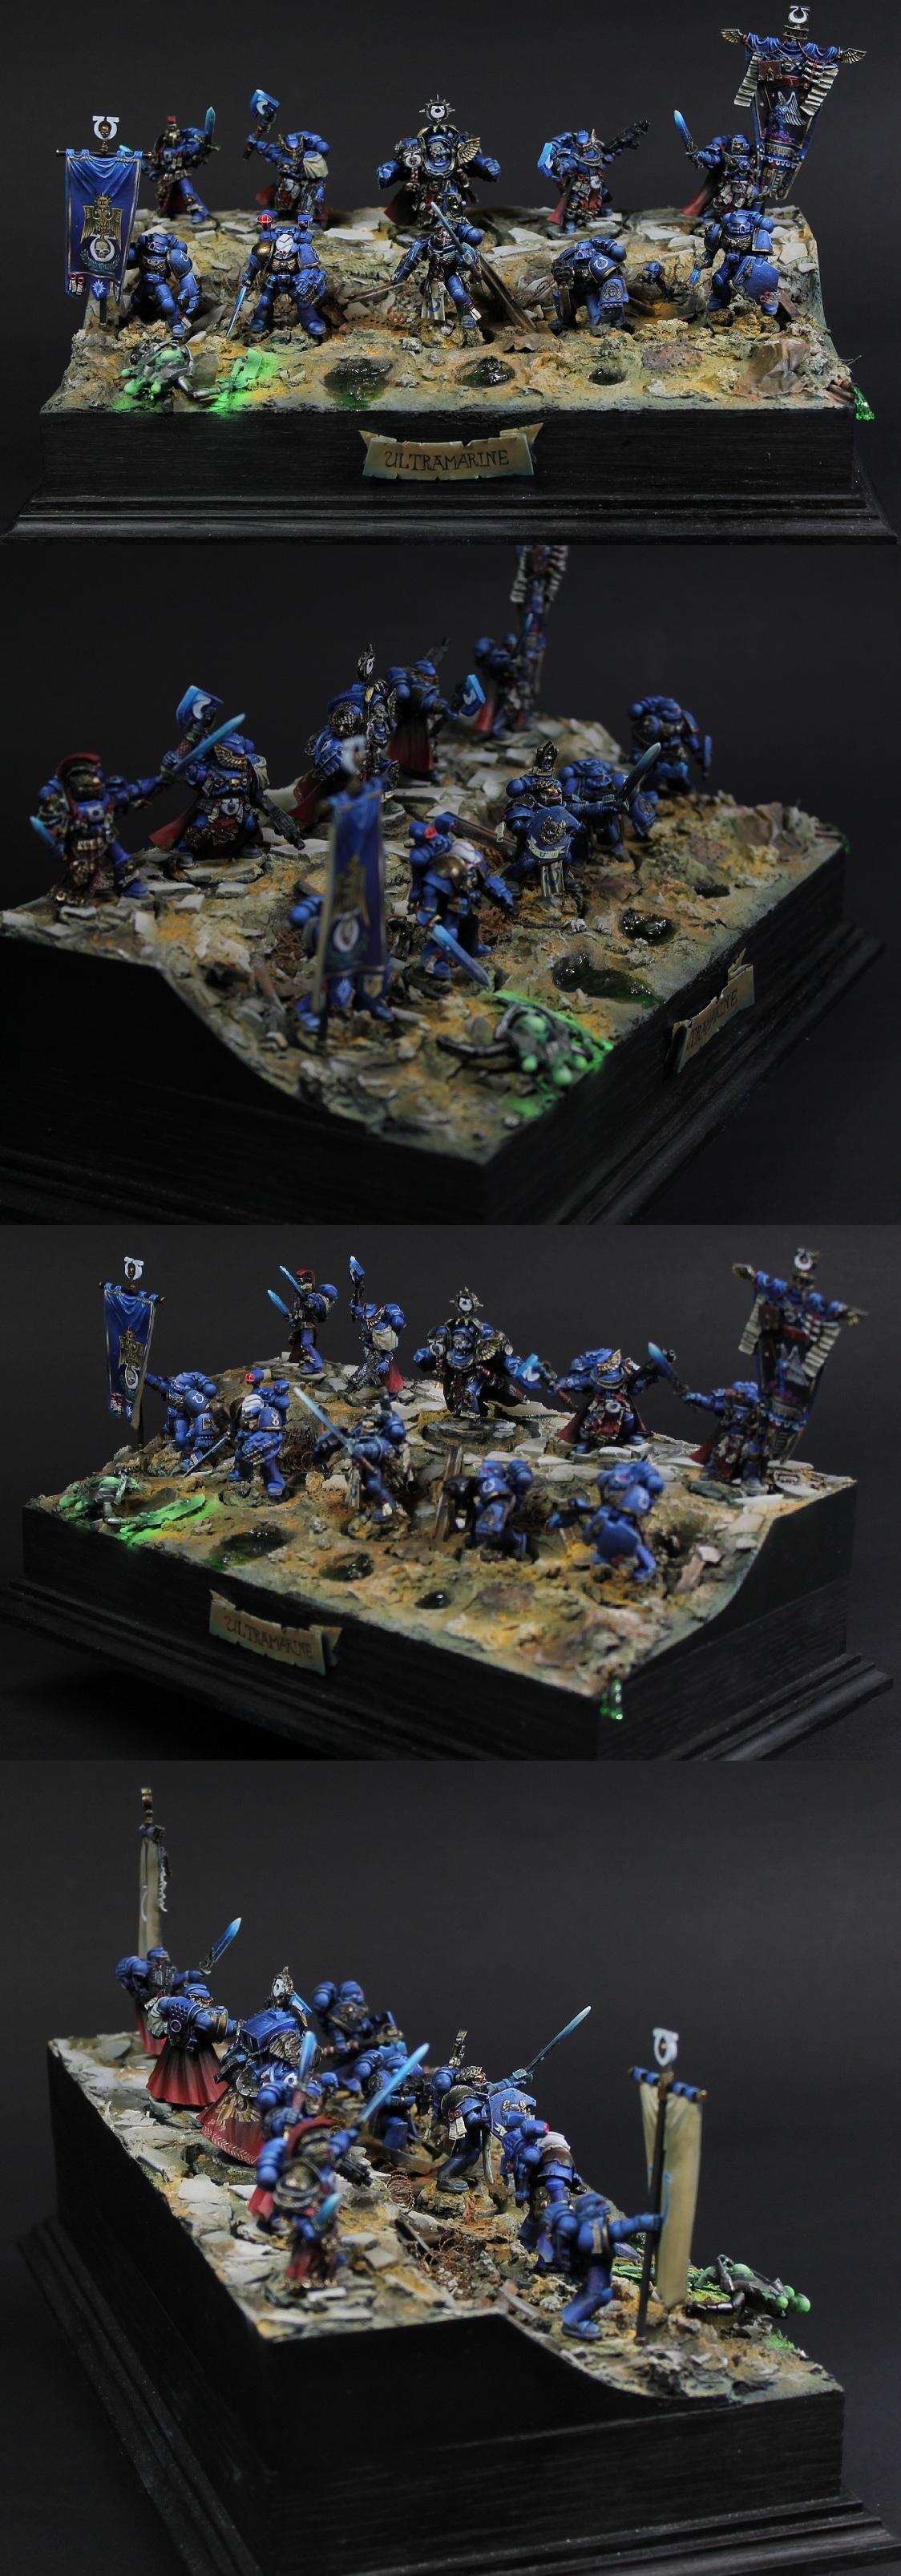 Ultramarines: Marneus Calgar, Honour Guard and Command Squad